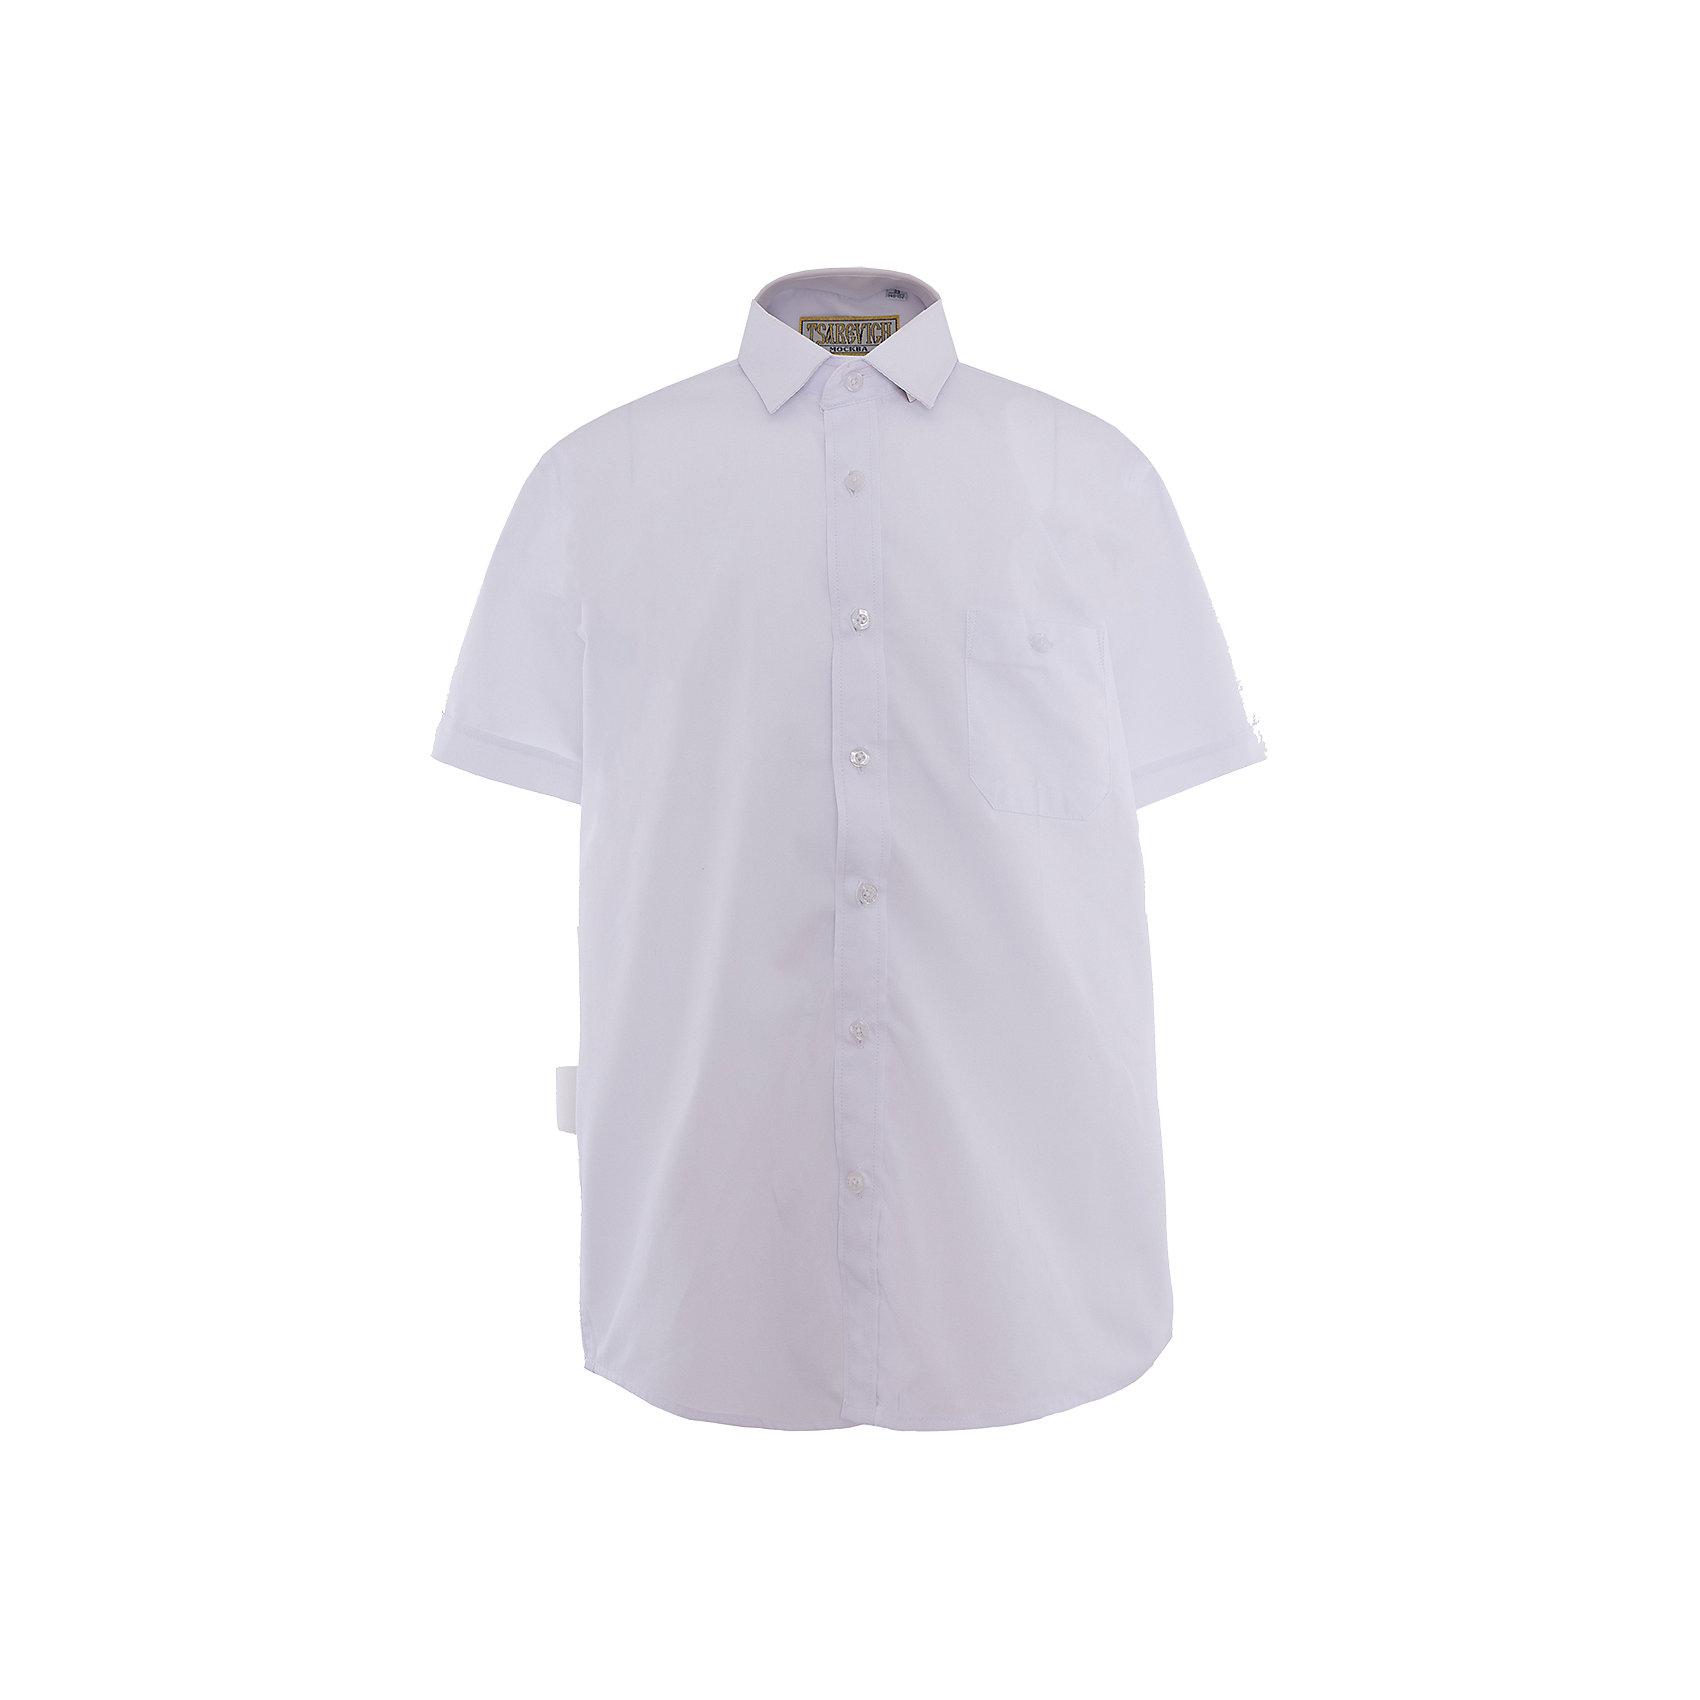 Рубашка для мальчика  TsarevichБлузки и рубашки<br>Рубашка для мальчика от российской марки Tsarevich.<br>Состав:<br>80% хлопок  20% полиэстер<br><br>Ширина мм: 174<br>Глубина мм: 10<br>Высота мм: 169<br>Вес г: 157<br>Цвет: белый<br>Возраст от месяцев: 84<br>Возраст до месяцев: 96<br>Пол: Мужской<br>Возраст: Детский<br>Размер: 122/128,164/170,134/140,158/164,152/158,146/152,140/146,128/134<br>SKU: 4163785